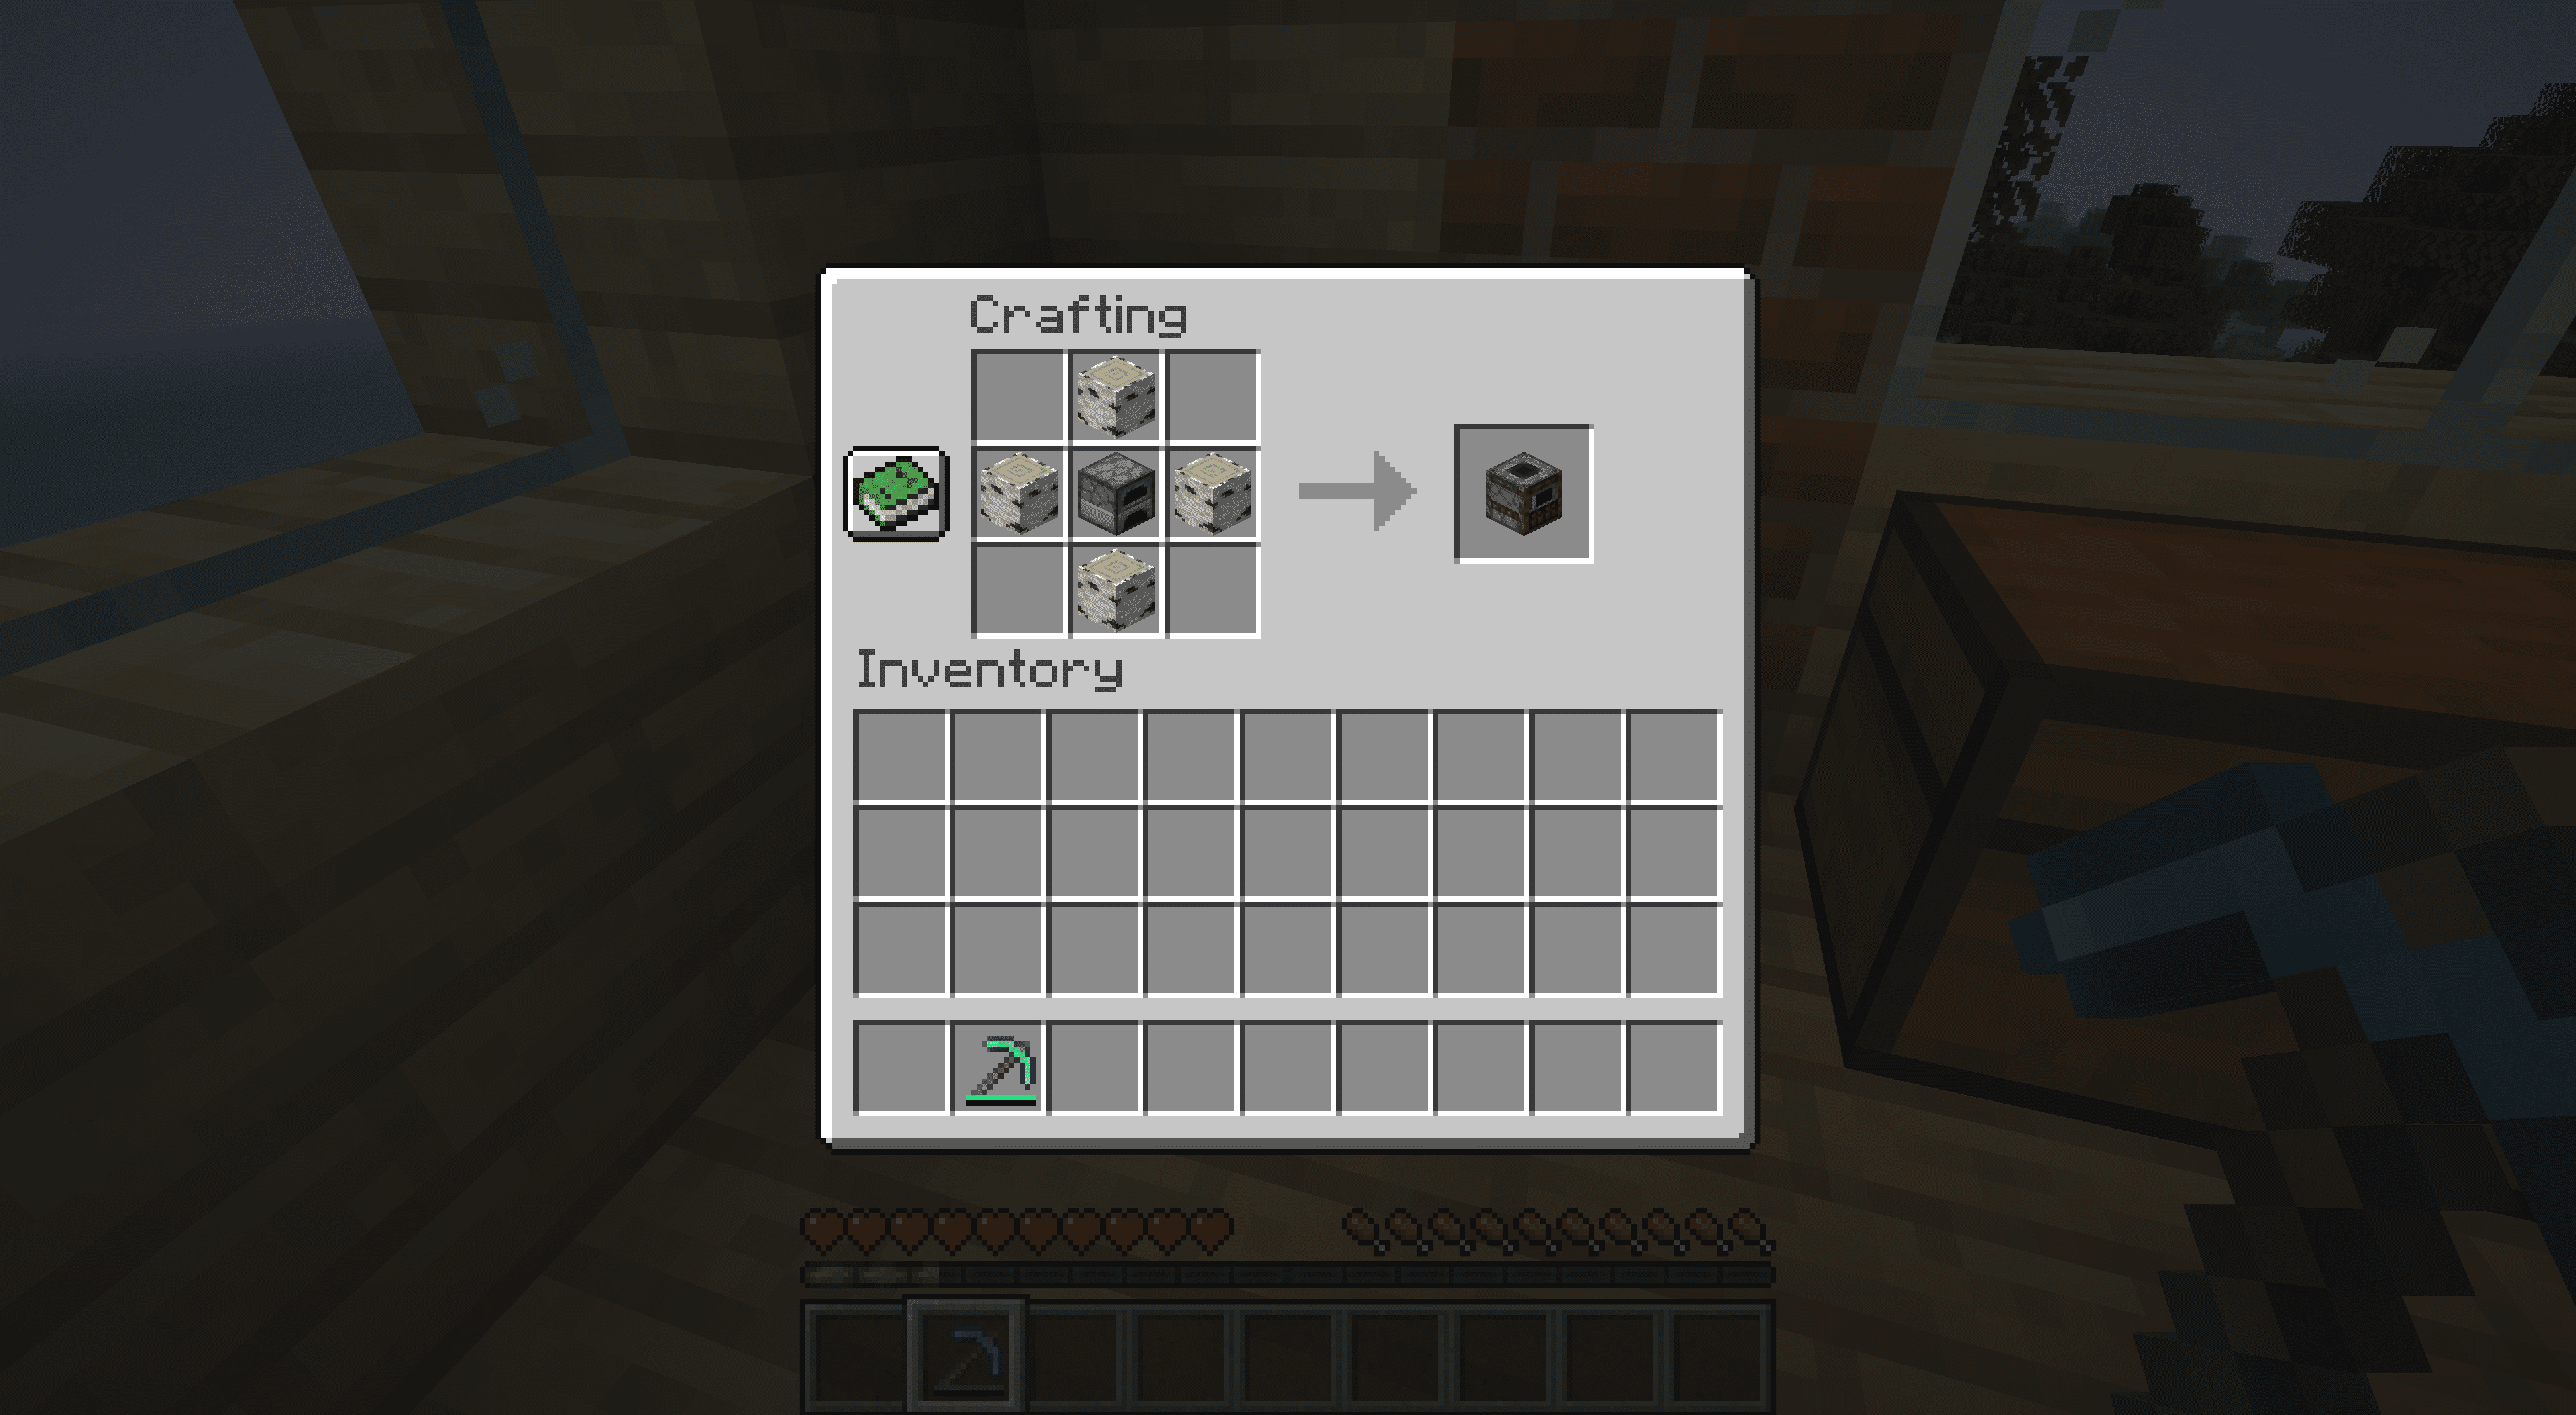 The smoker crafting recipe in Minecraft.